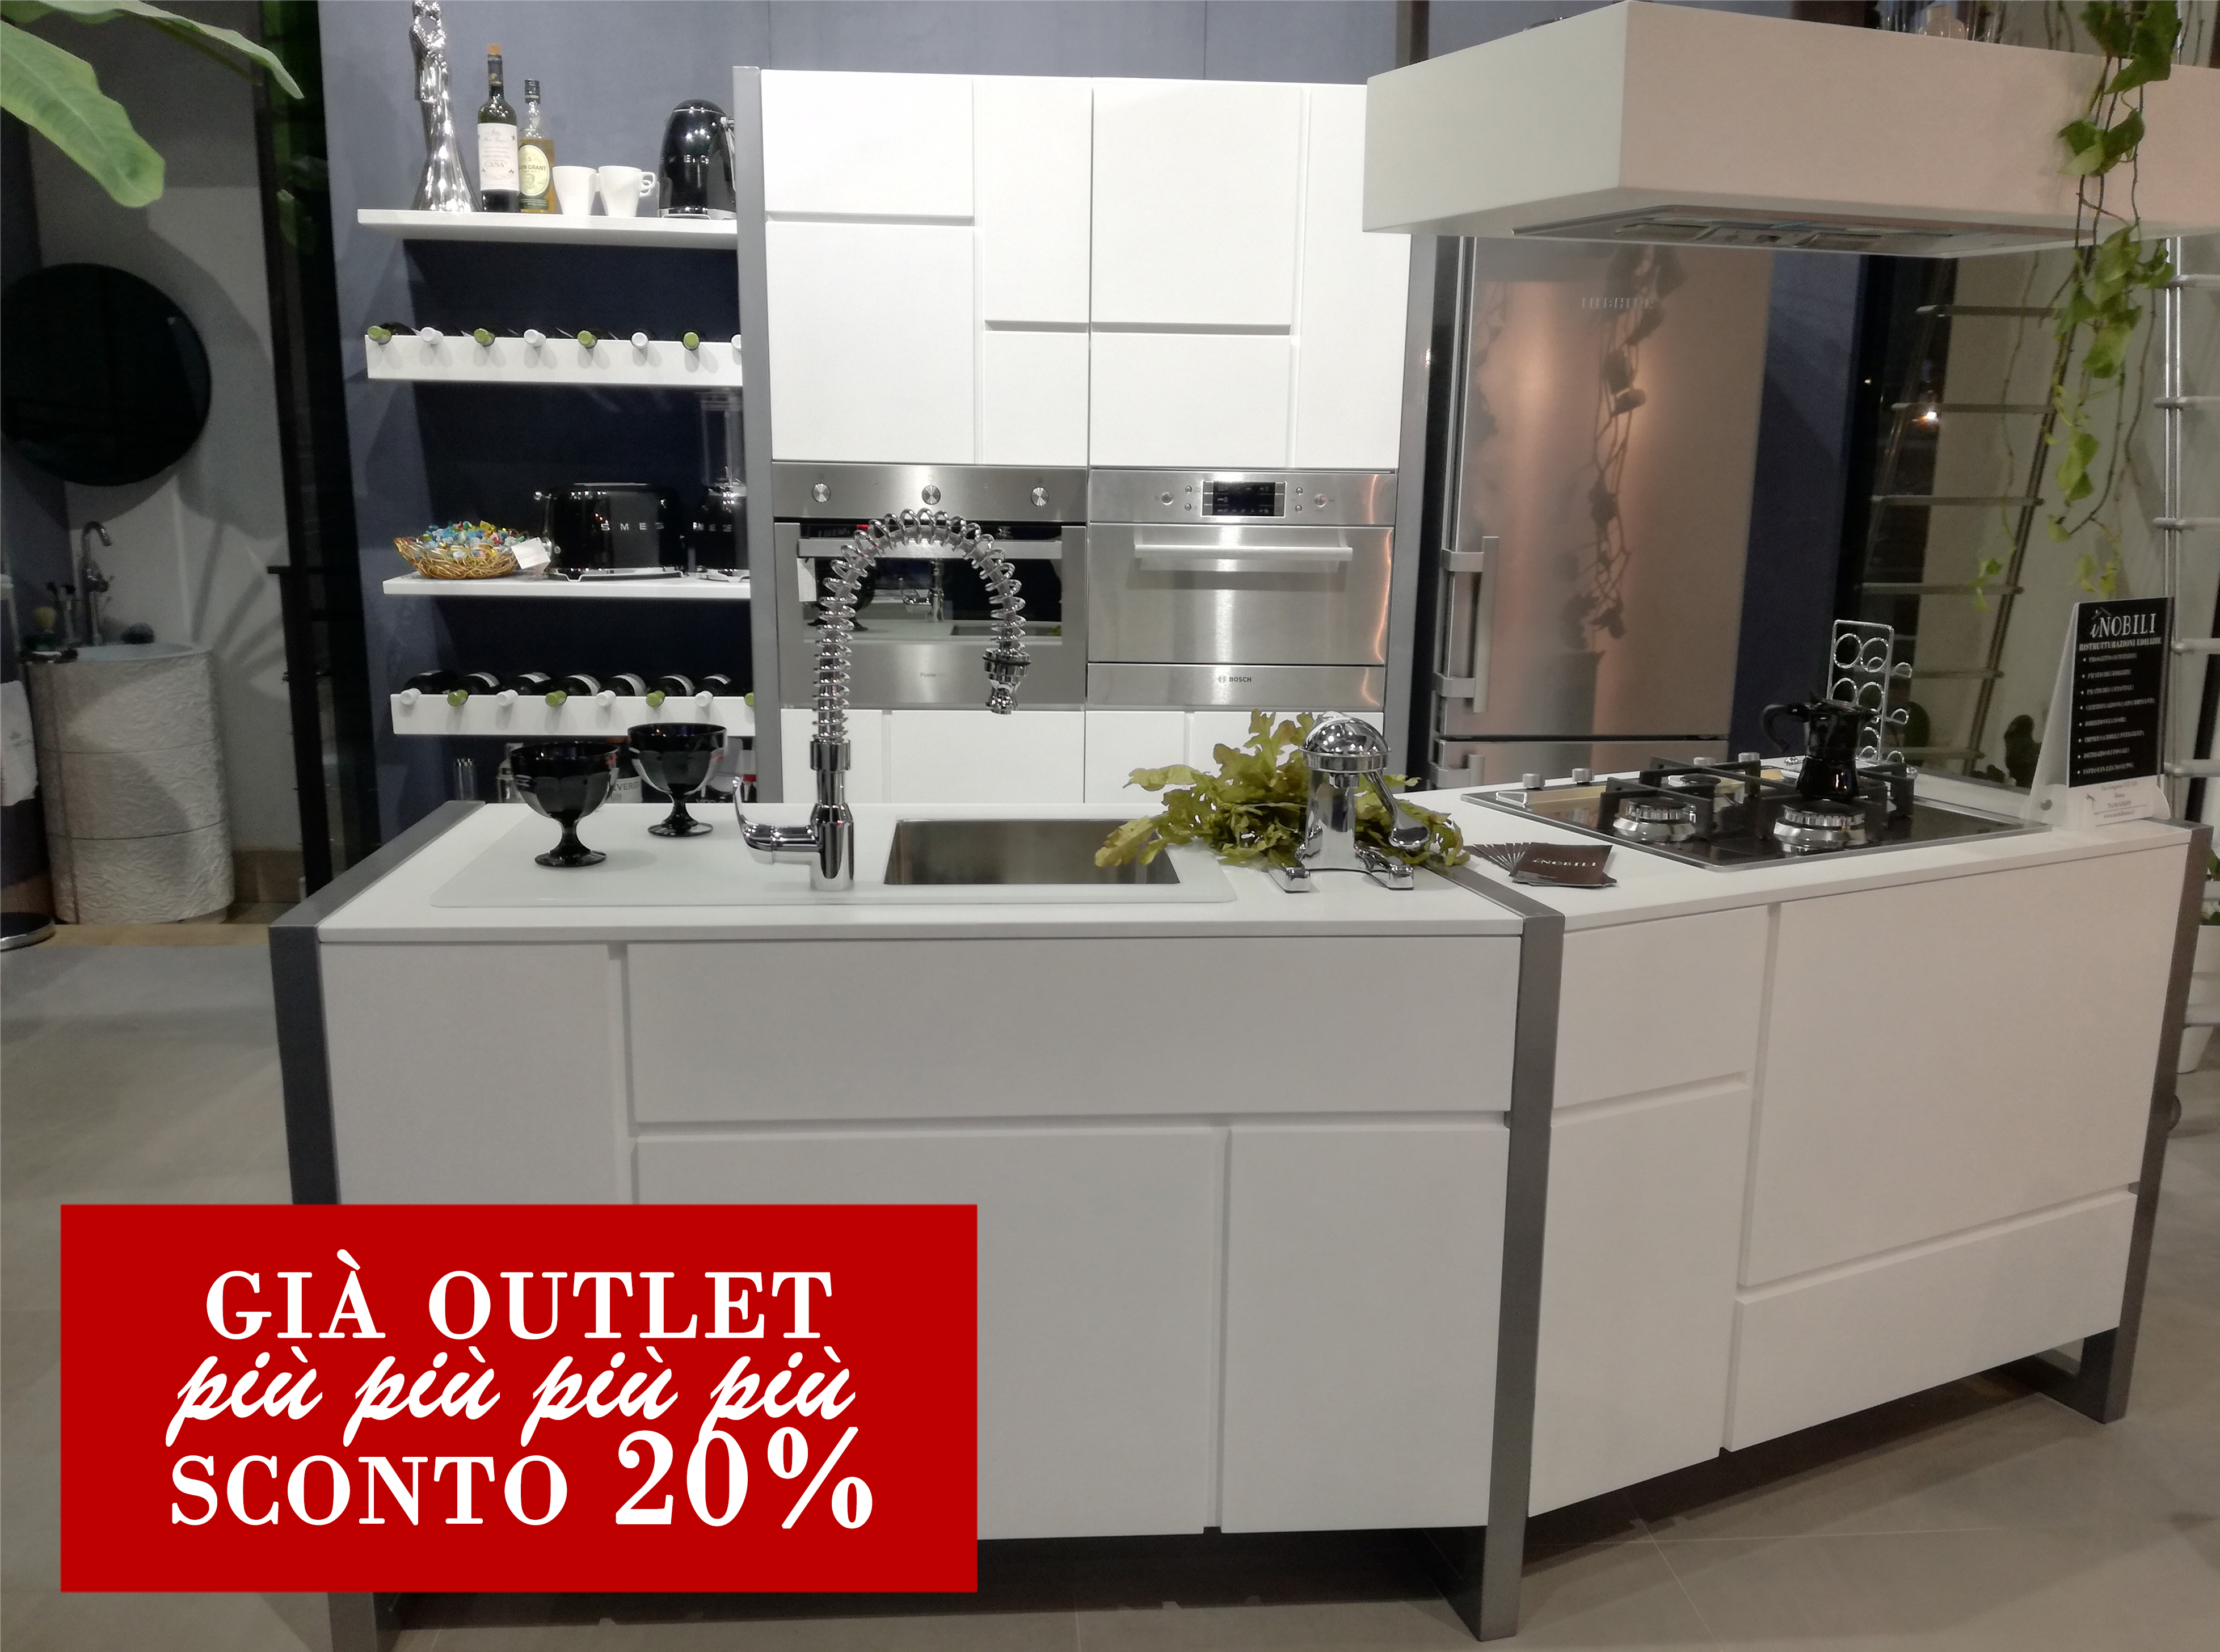 SCONTO -20% CUCINE MODERNE | iNobili Casa - Cucine su misura ...